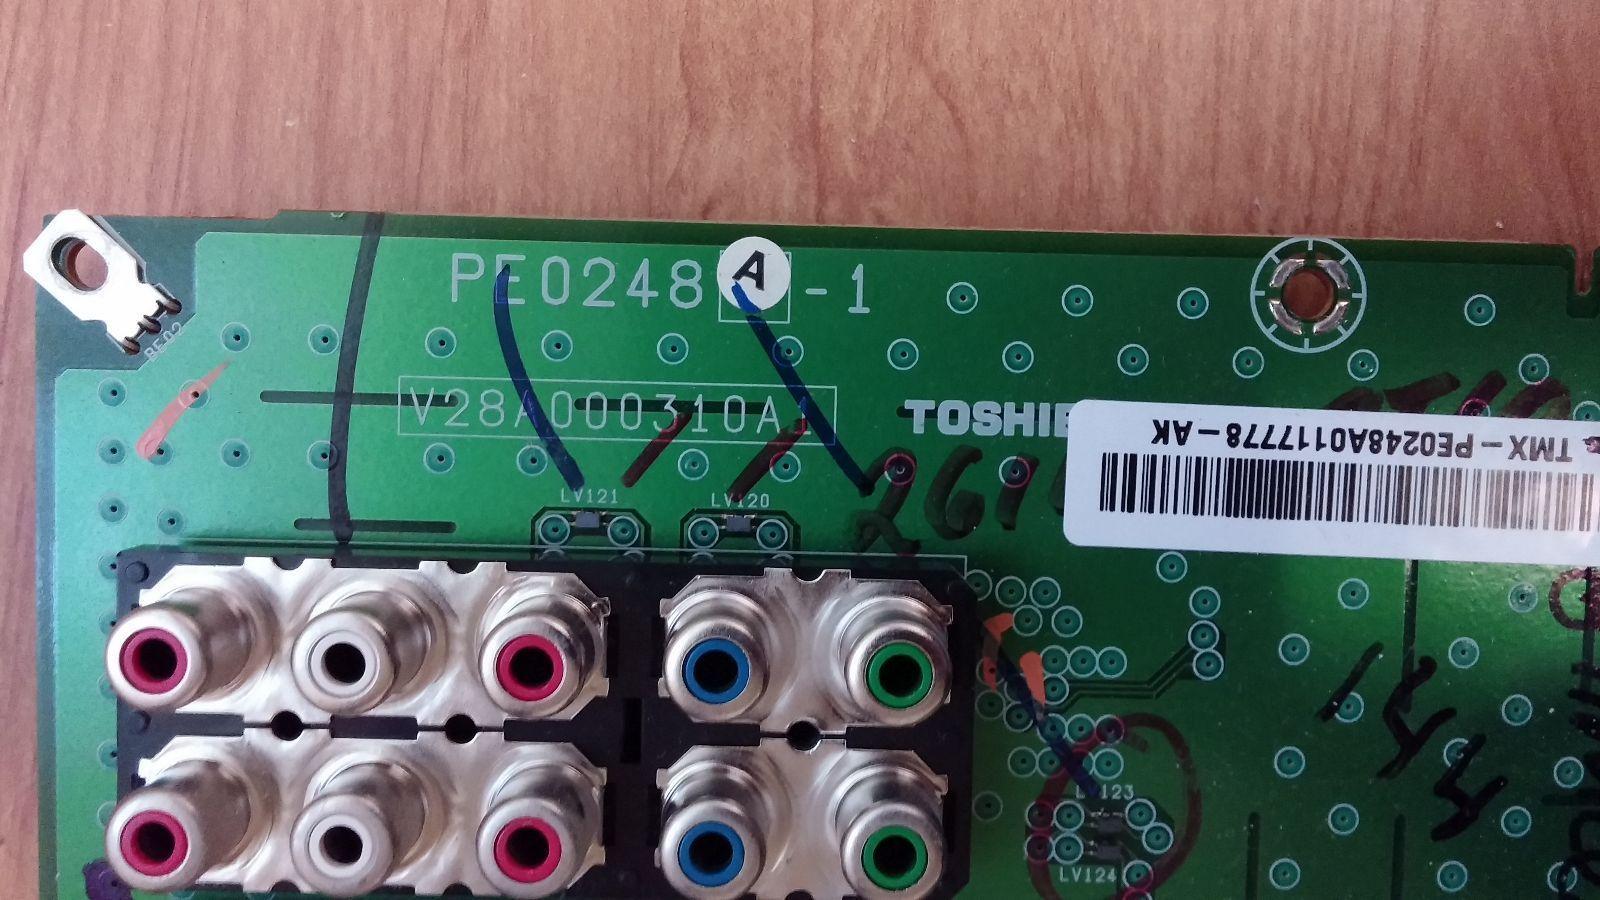 Toshiba 75005776 (PE0248A-1, V28A000310A1) AV Board